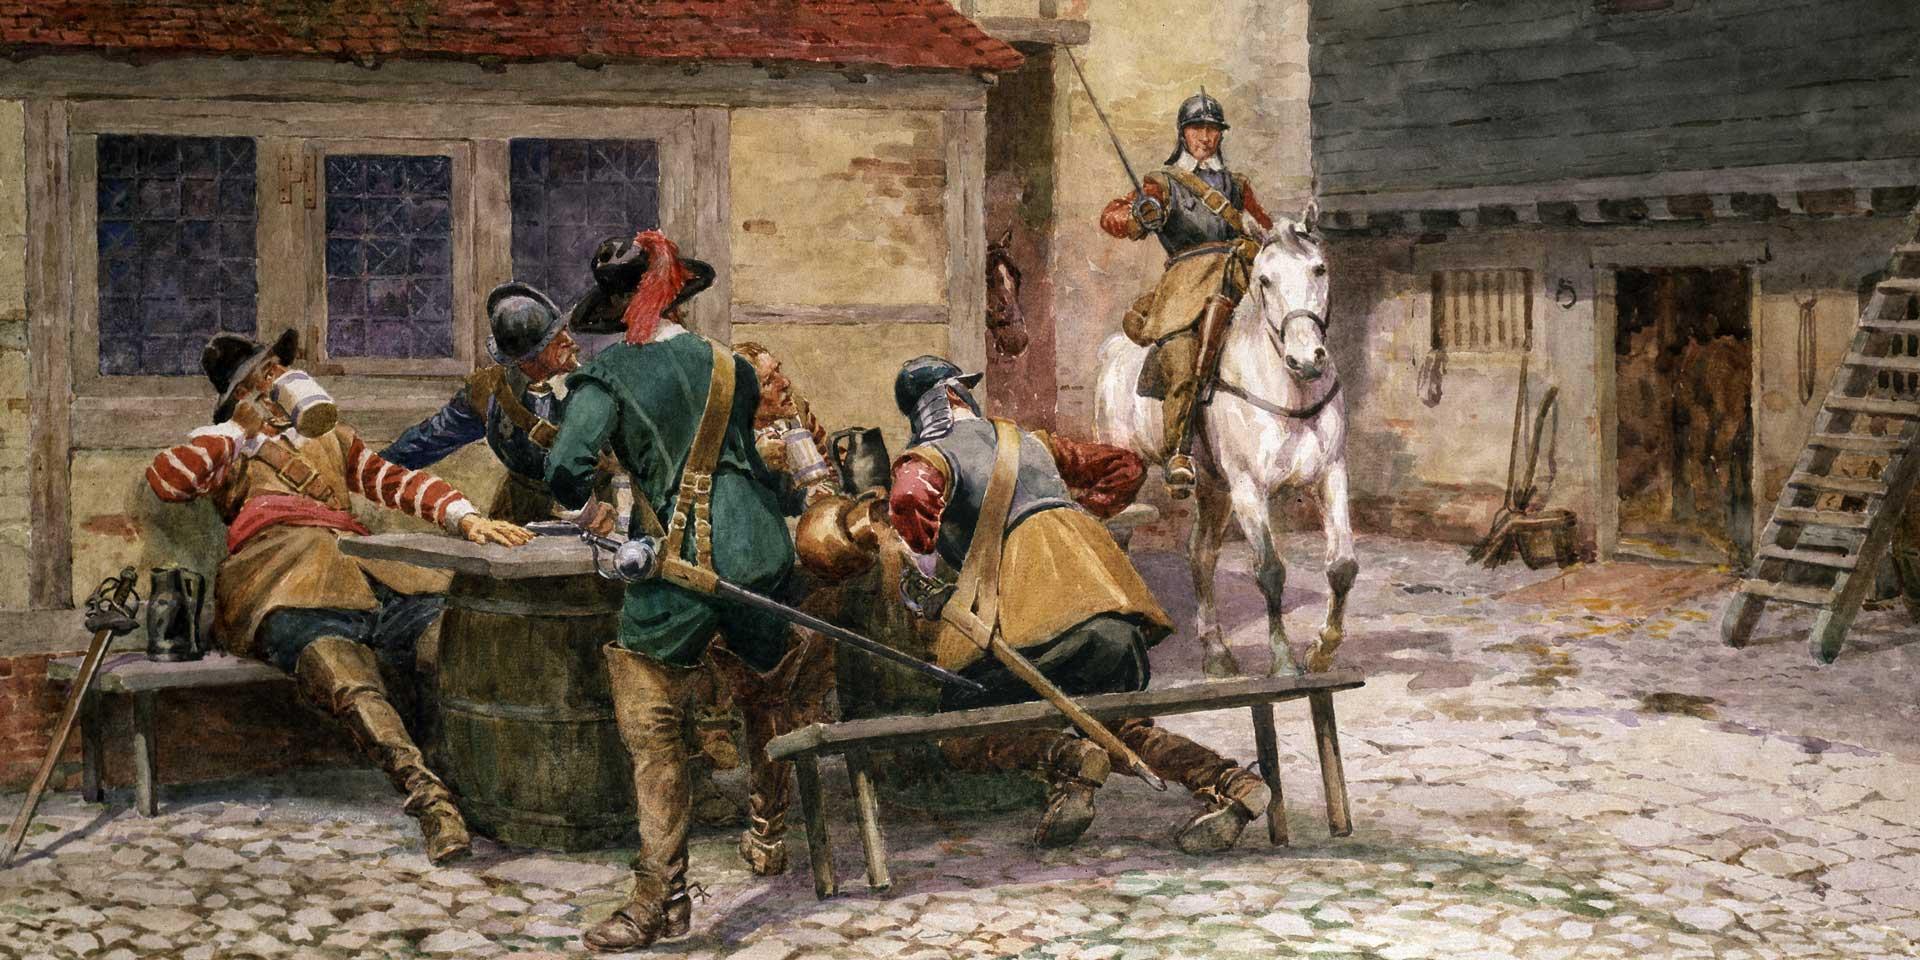 Parliamentarian soldiers at a tavern, c1645